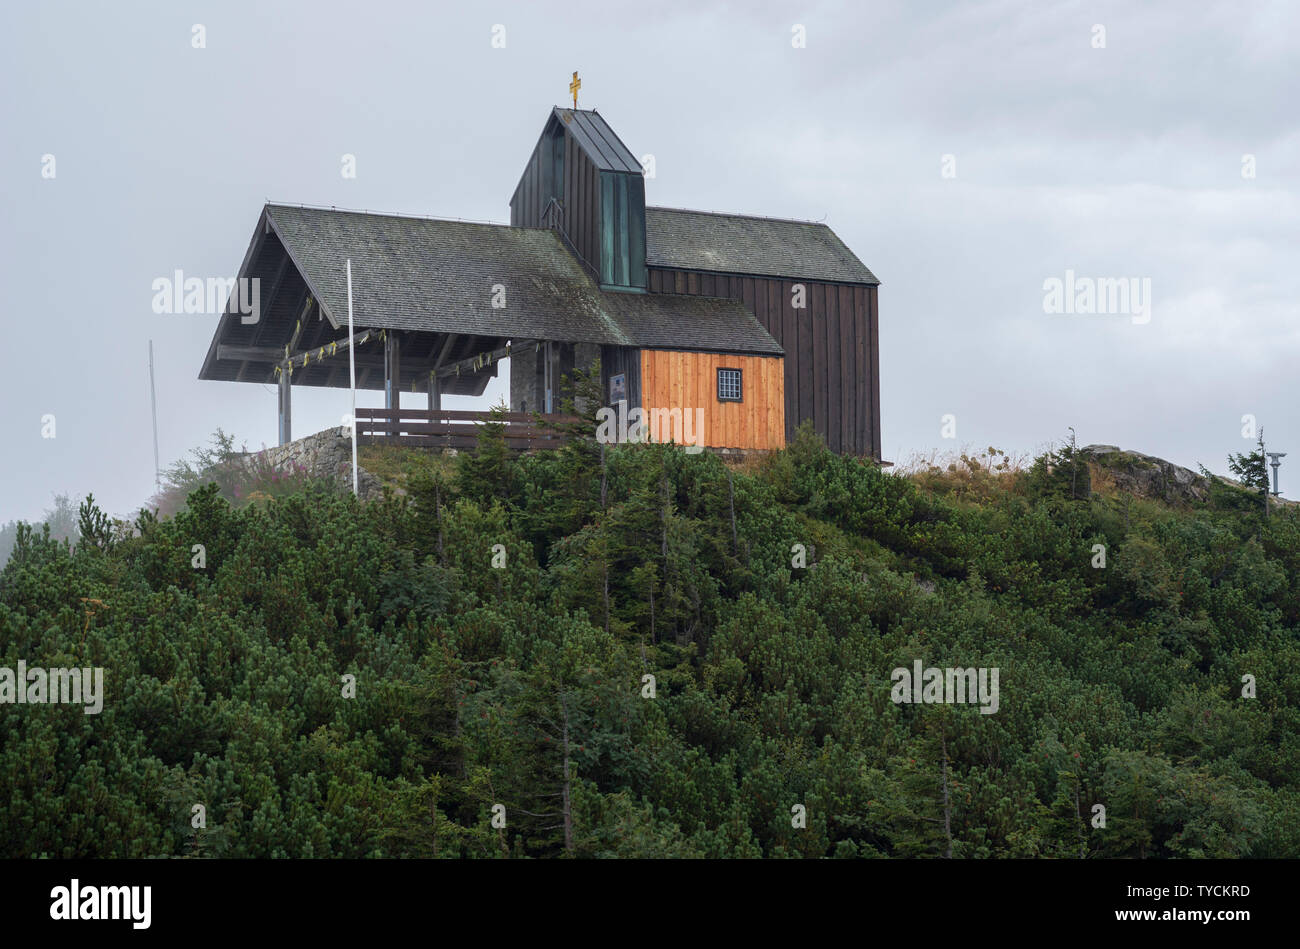 Hochfelln mountain, Tabor chapel, Hochfelln, Chiemgau, Upper Bavaria, Bavaria, Bavarian Alps, Germany - Stock Image